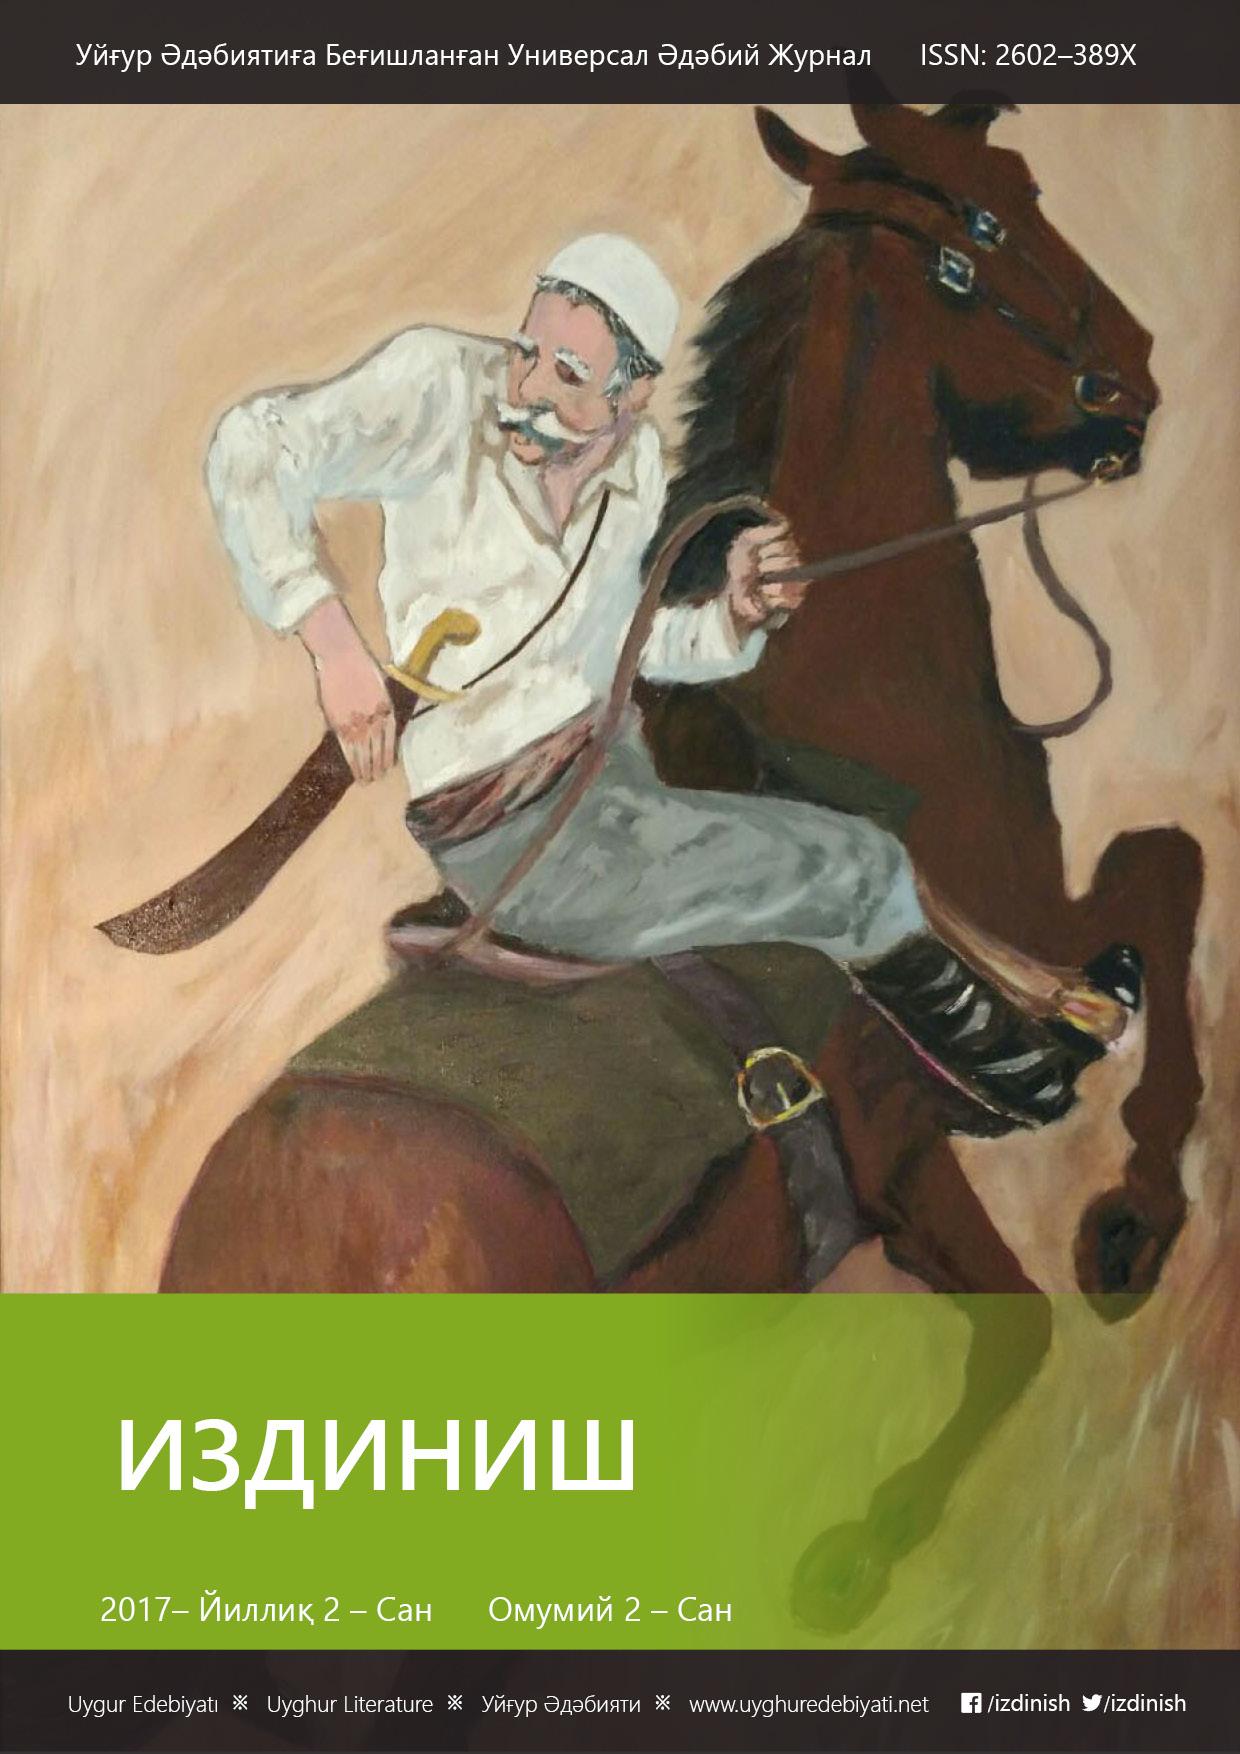 izdinish jurnili 2017 02 Slawiyan - ئىزدىنىش ژۇرنىلى 2017-يىللىق 2-سان (سىلاۋىيان يېزىقى نۇسخىسى)